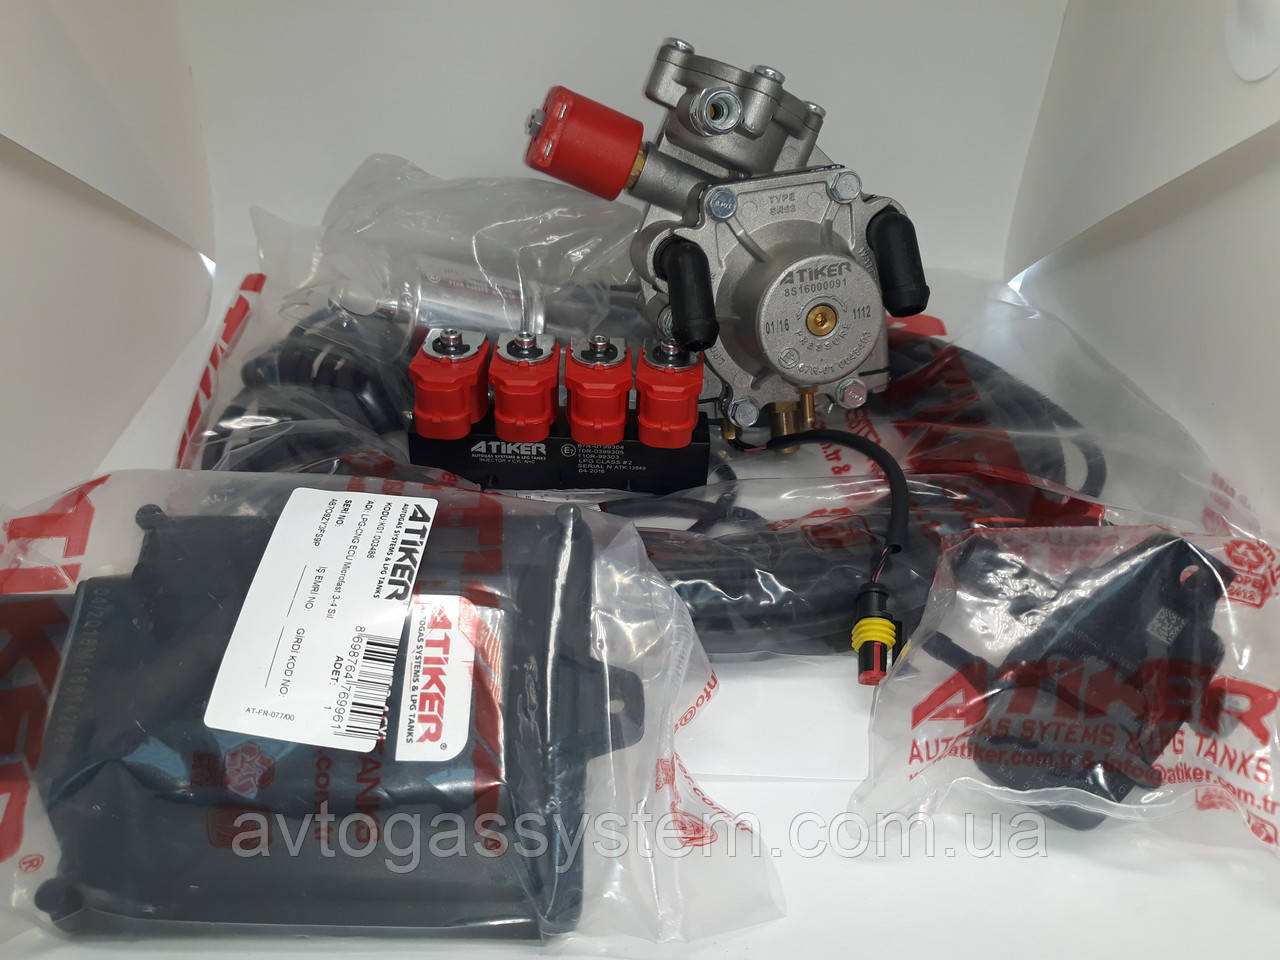 Міні комплект Atiker MicroFast/Atiker SR 08/Atiker